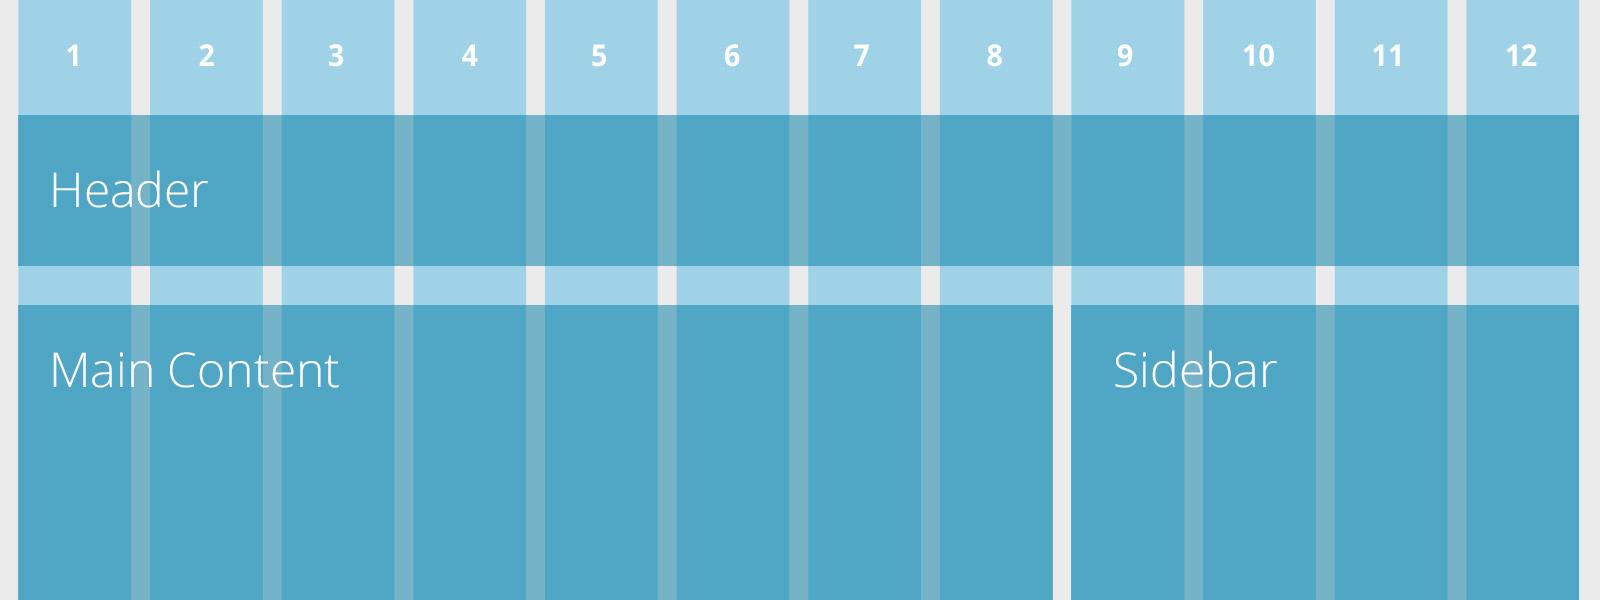 flexible grid responsive web design for mobile